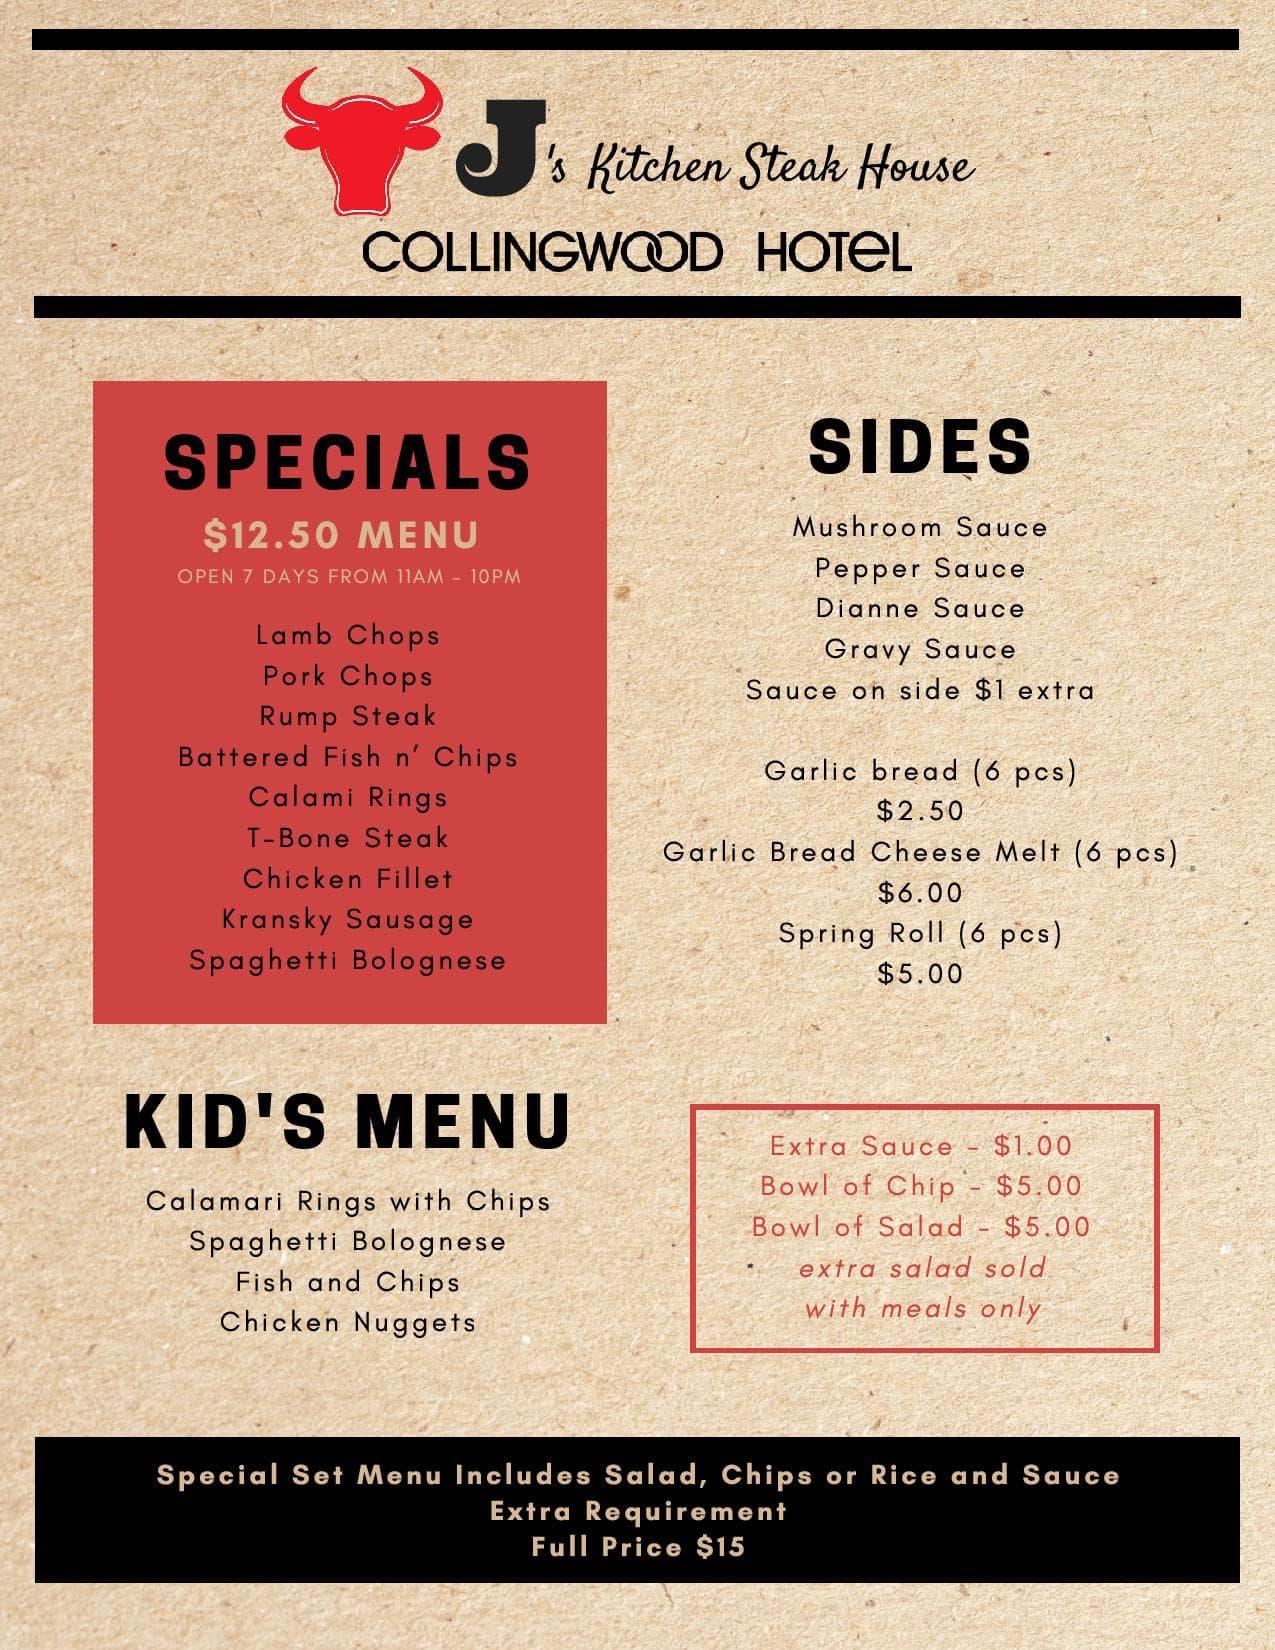 Js kitchen steak house collingwood hotel menu